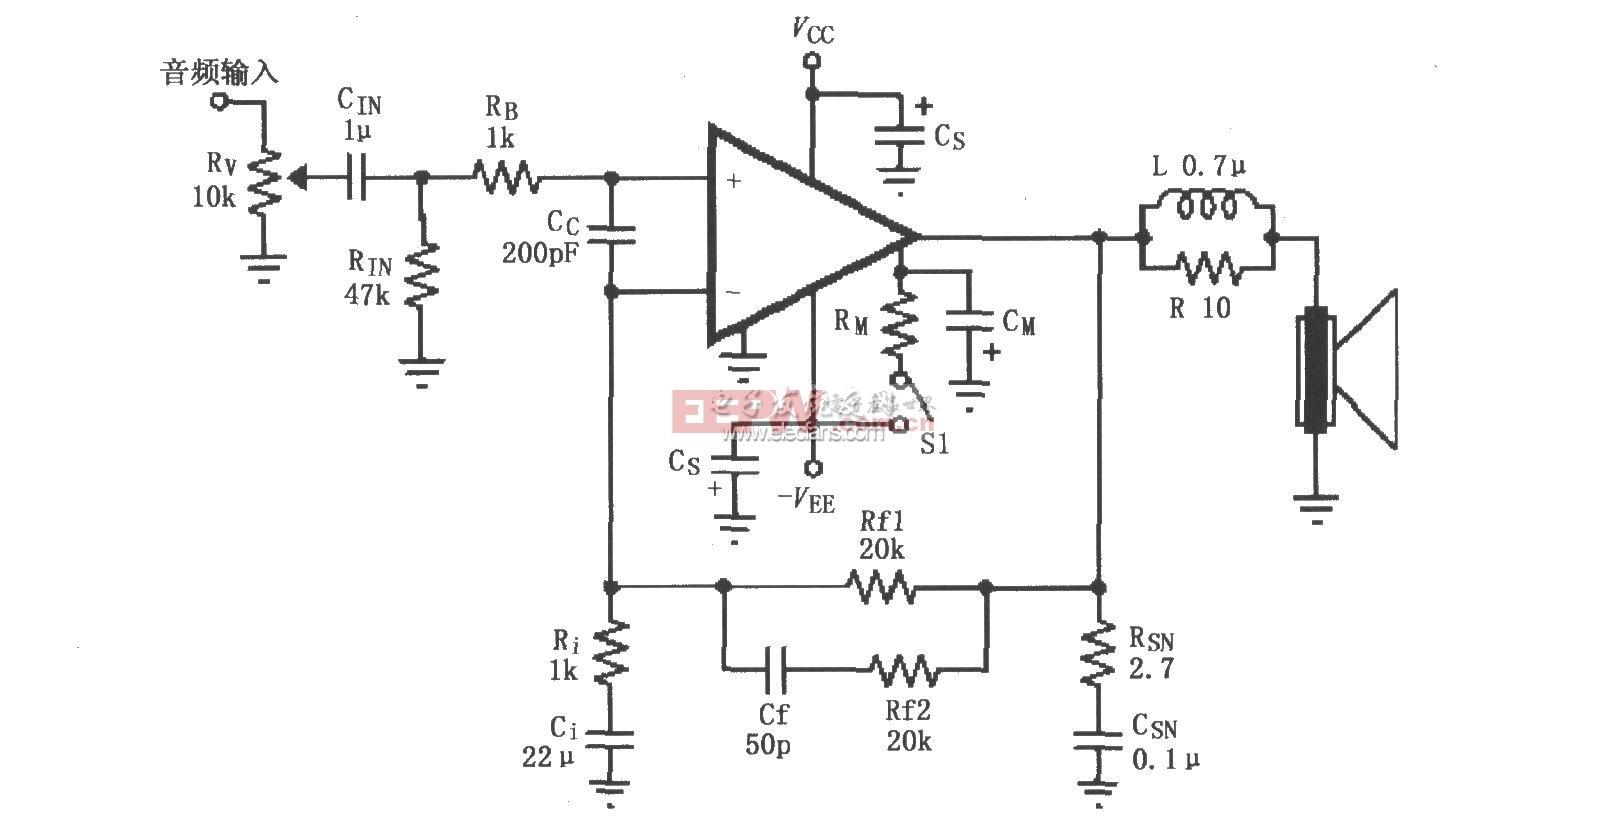 LM4732构成的辅助音频功率放大电路图